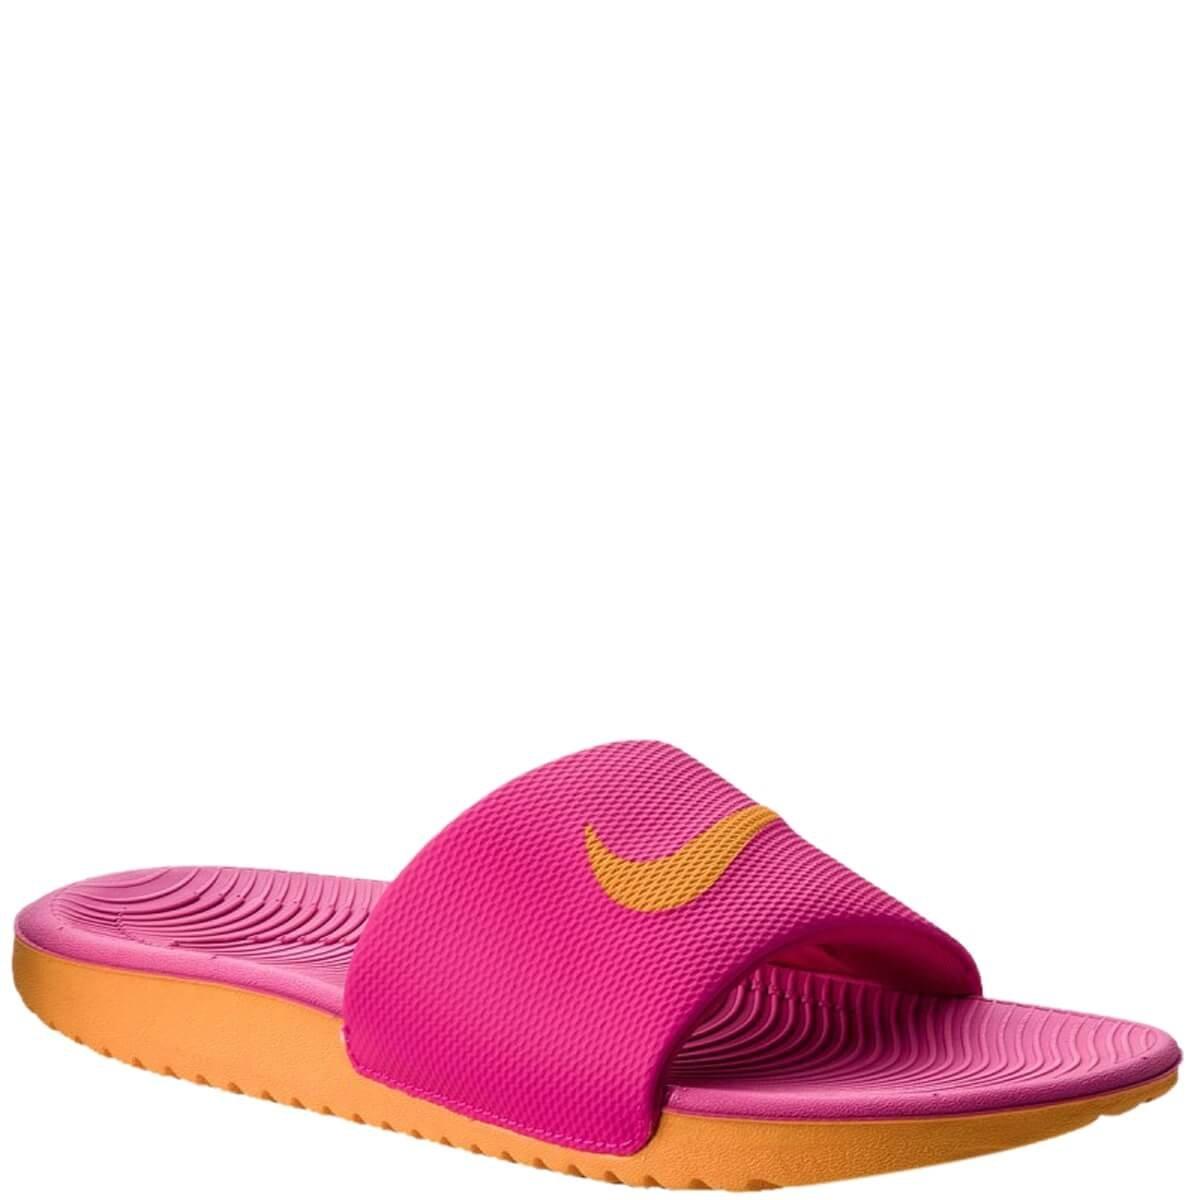 9491e8e46eb192 Bizz Store - Chinelo Slide Feminino Nike Kawa